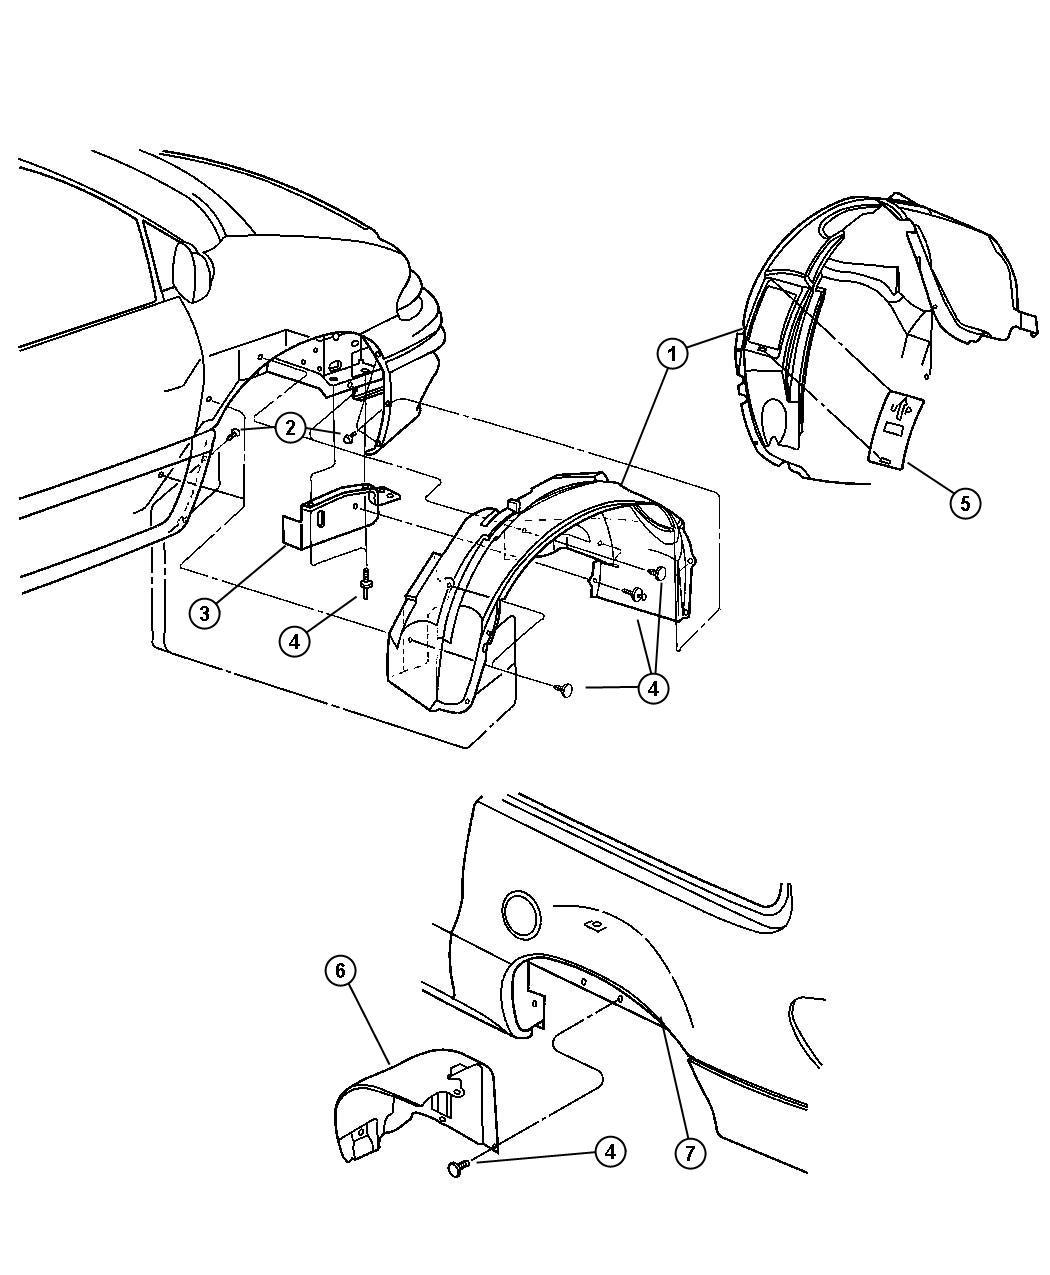 2006 Dodge Caravan Shield. Accessory drive. Engine, smpi